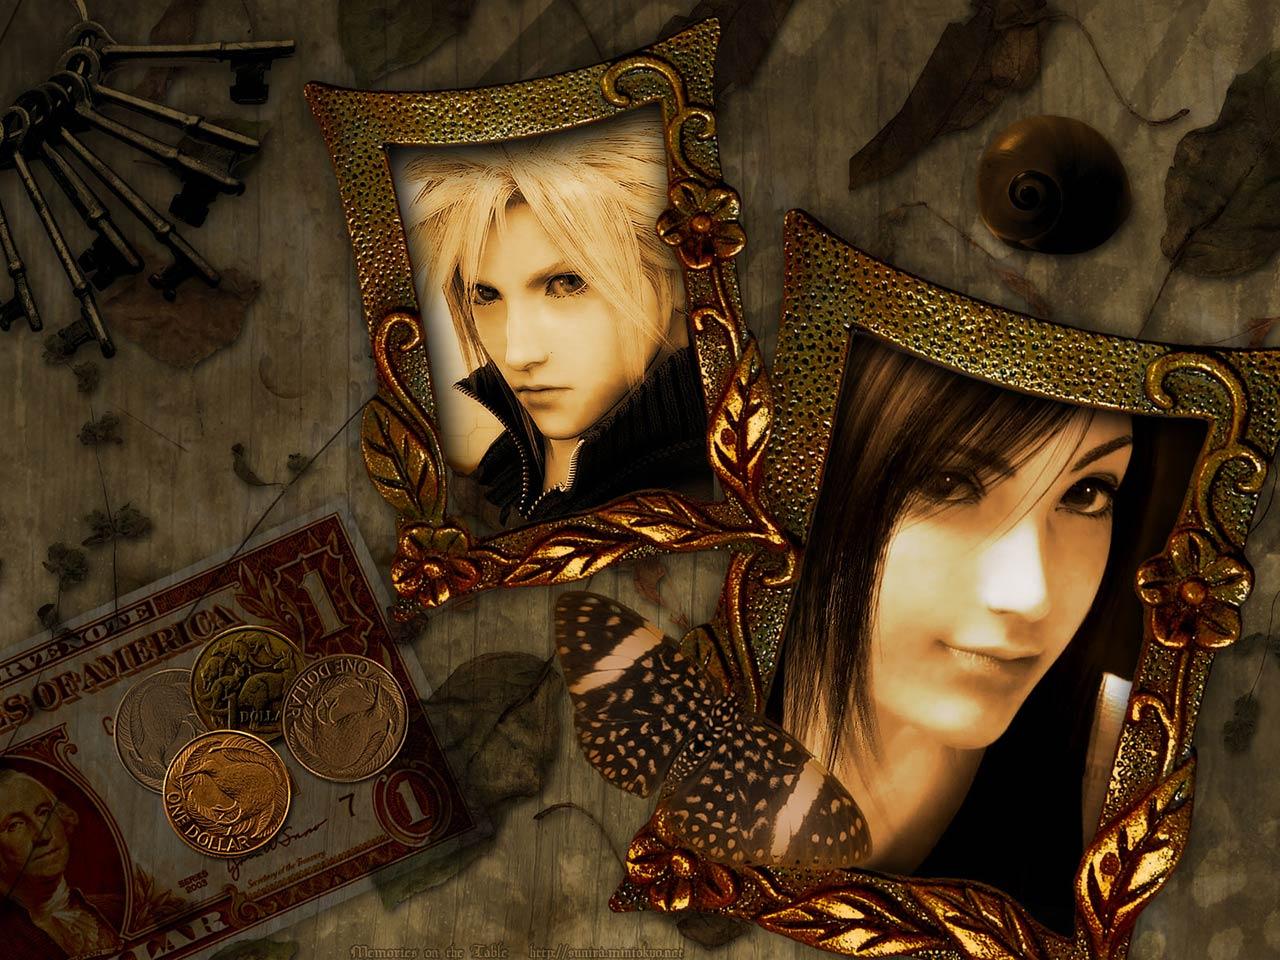 http://2.bp.blogspot.com/-grEKUv1G-rU/T0uF0vhw78I/AAAAAAAACYs/e8NbnO17n50/s1600/Final-Fantasy-VII-Wallpapers-104.jpg